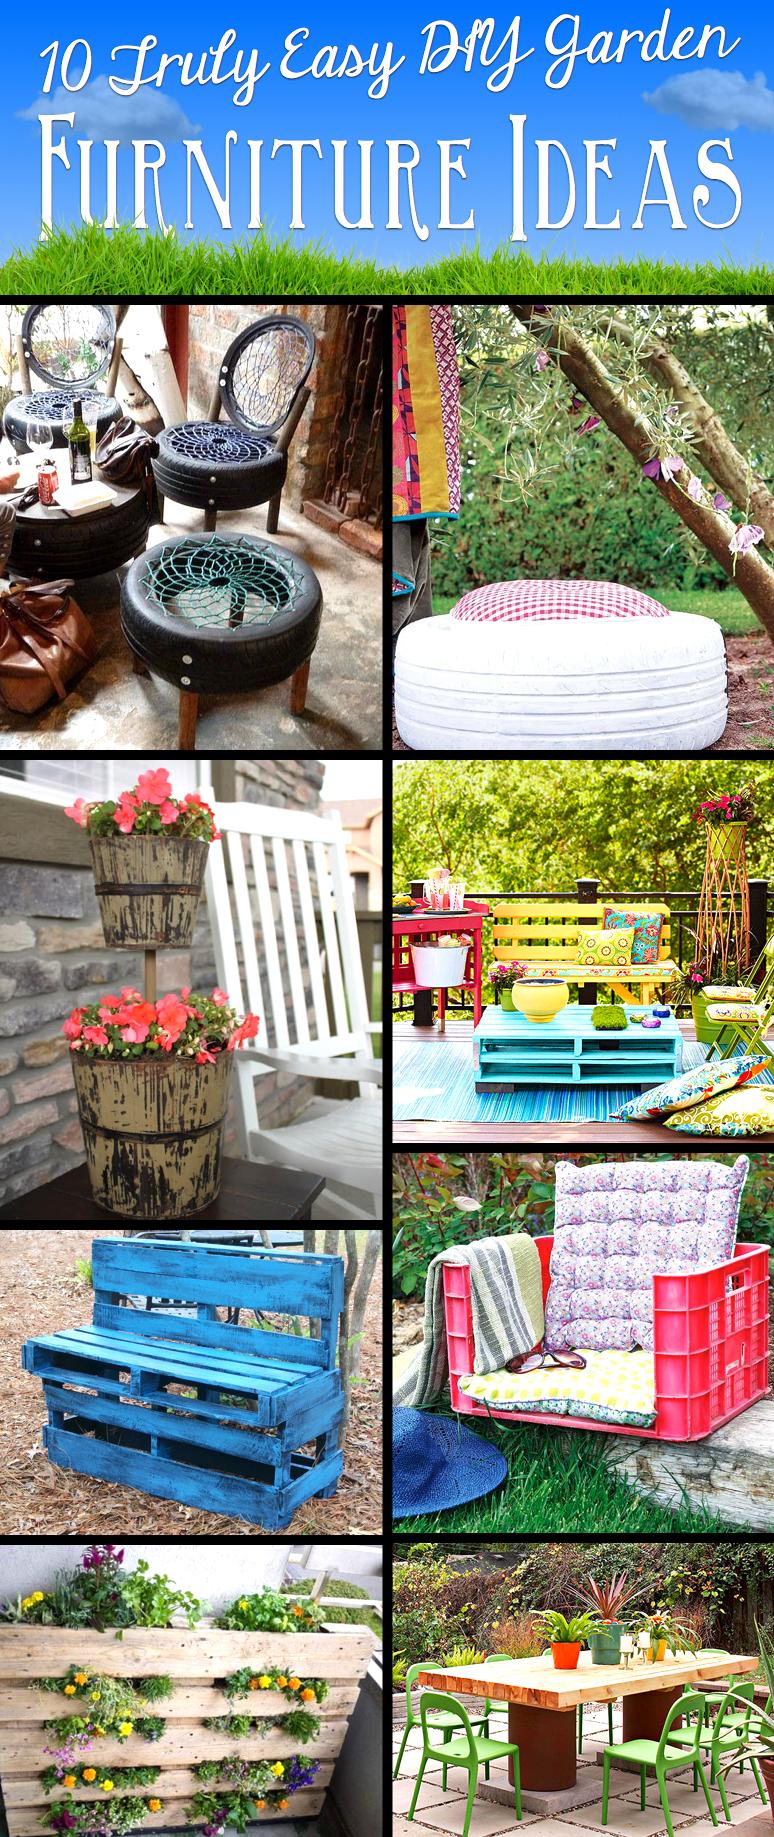 Fantastic 10 Truly Easy Yet Innovative Diy Garden Furniture Ideas Home Interior And Landscaping Ologienasavecom